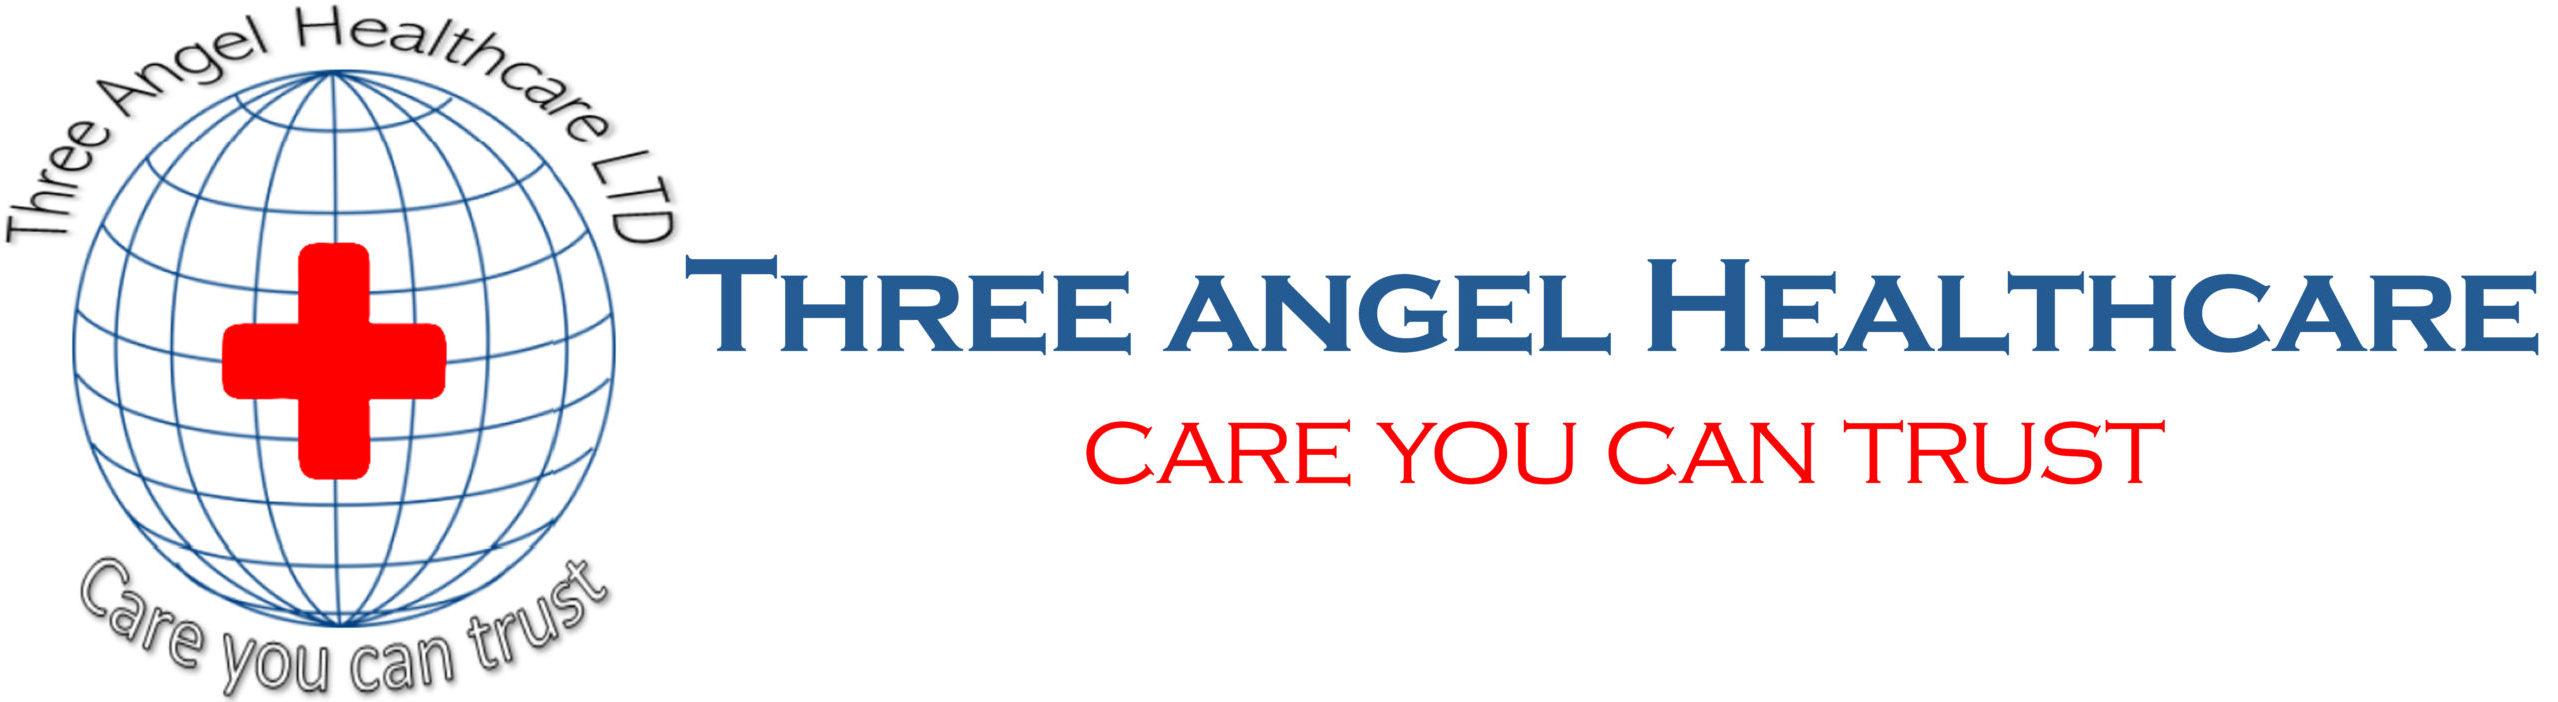 Three Angel Healthcare LTD